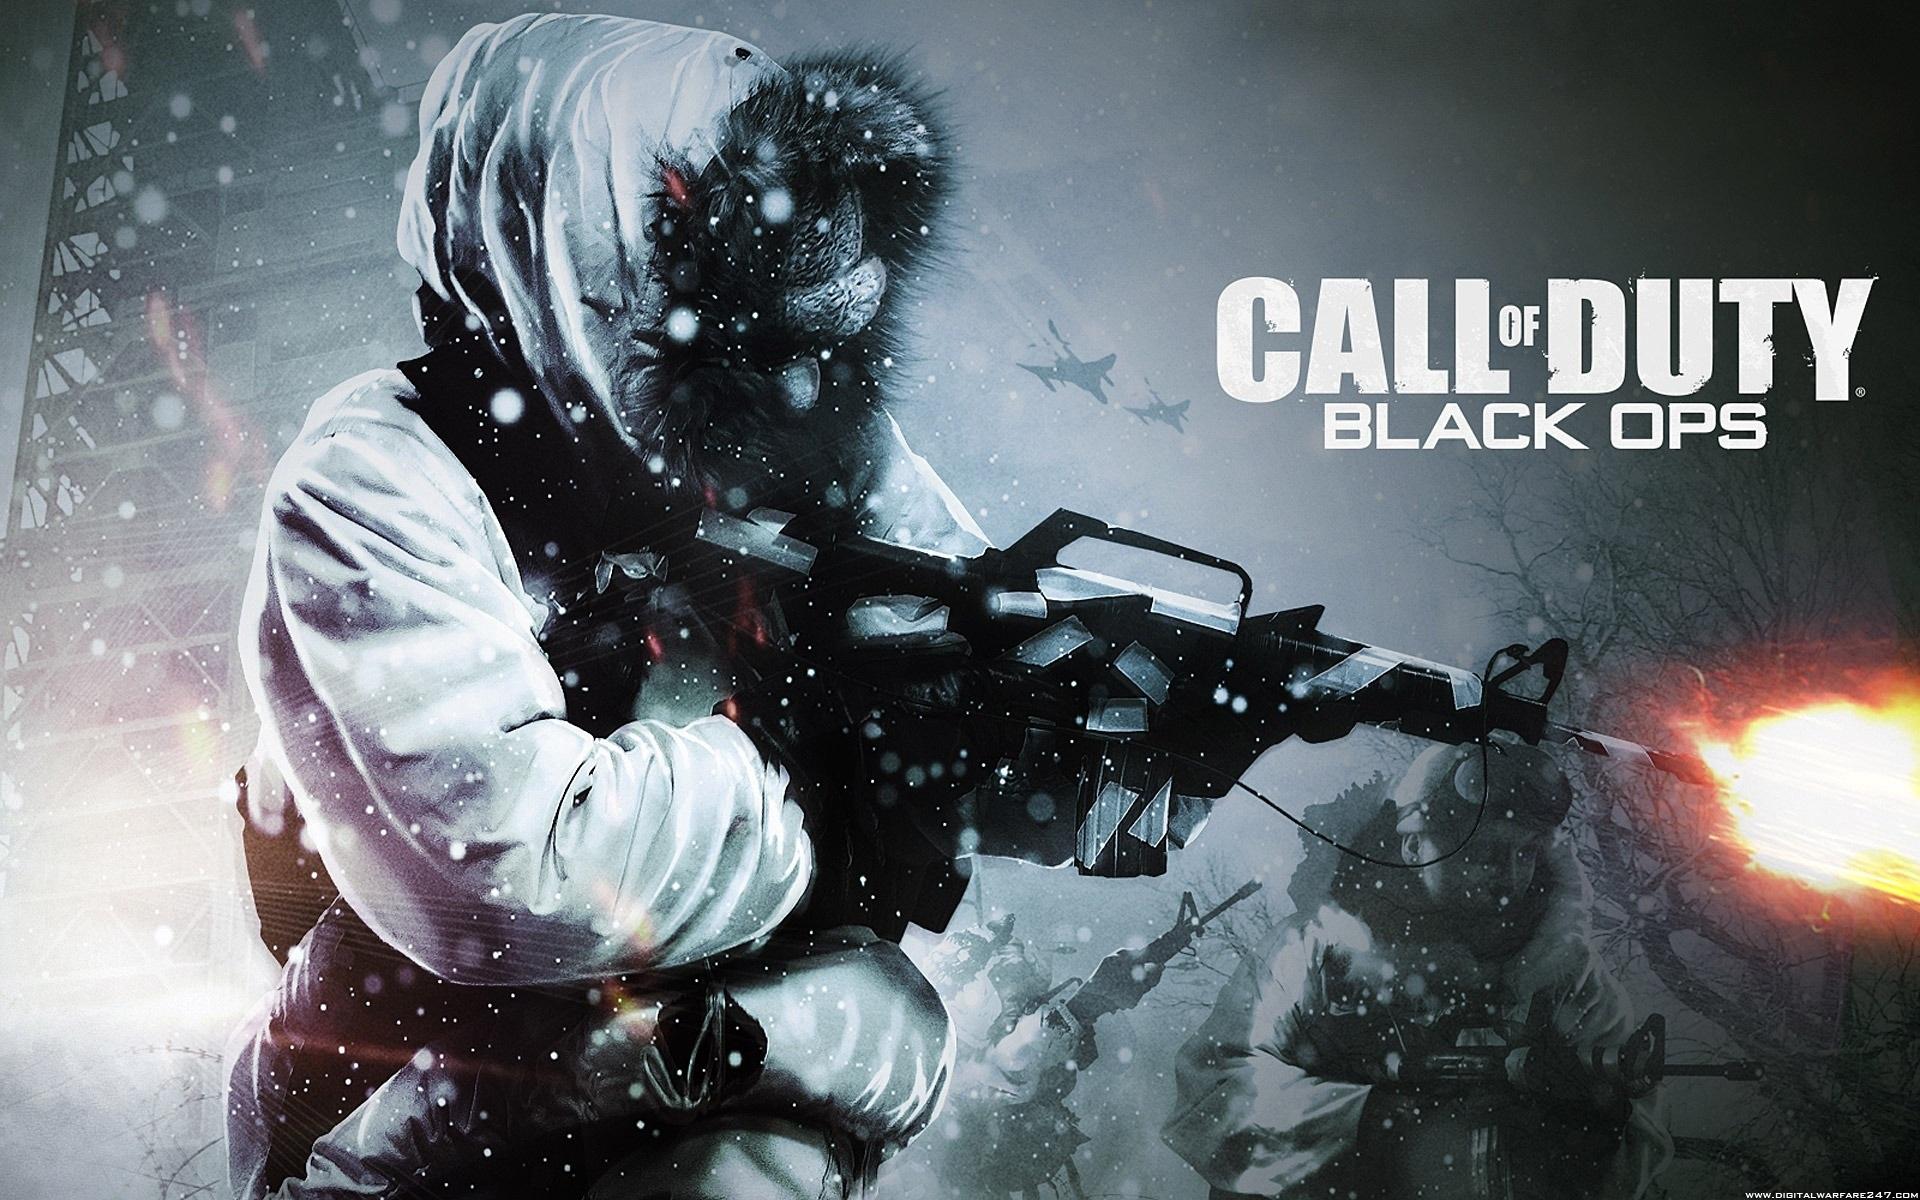 Cod Call Of Dutyの壁紙に使える画像集 コール オブ デューティ